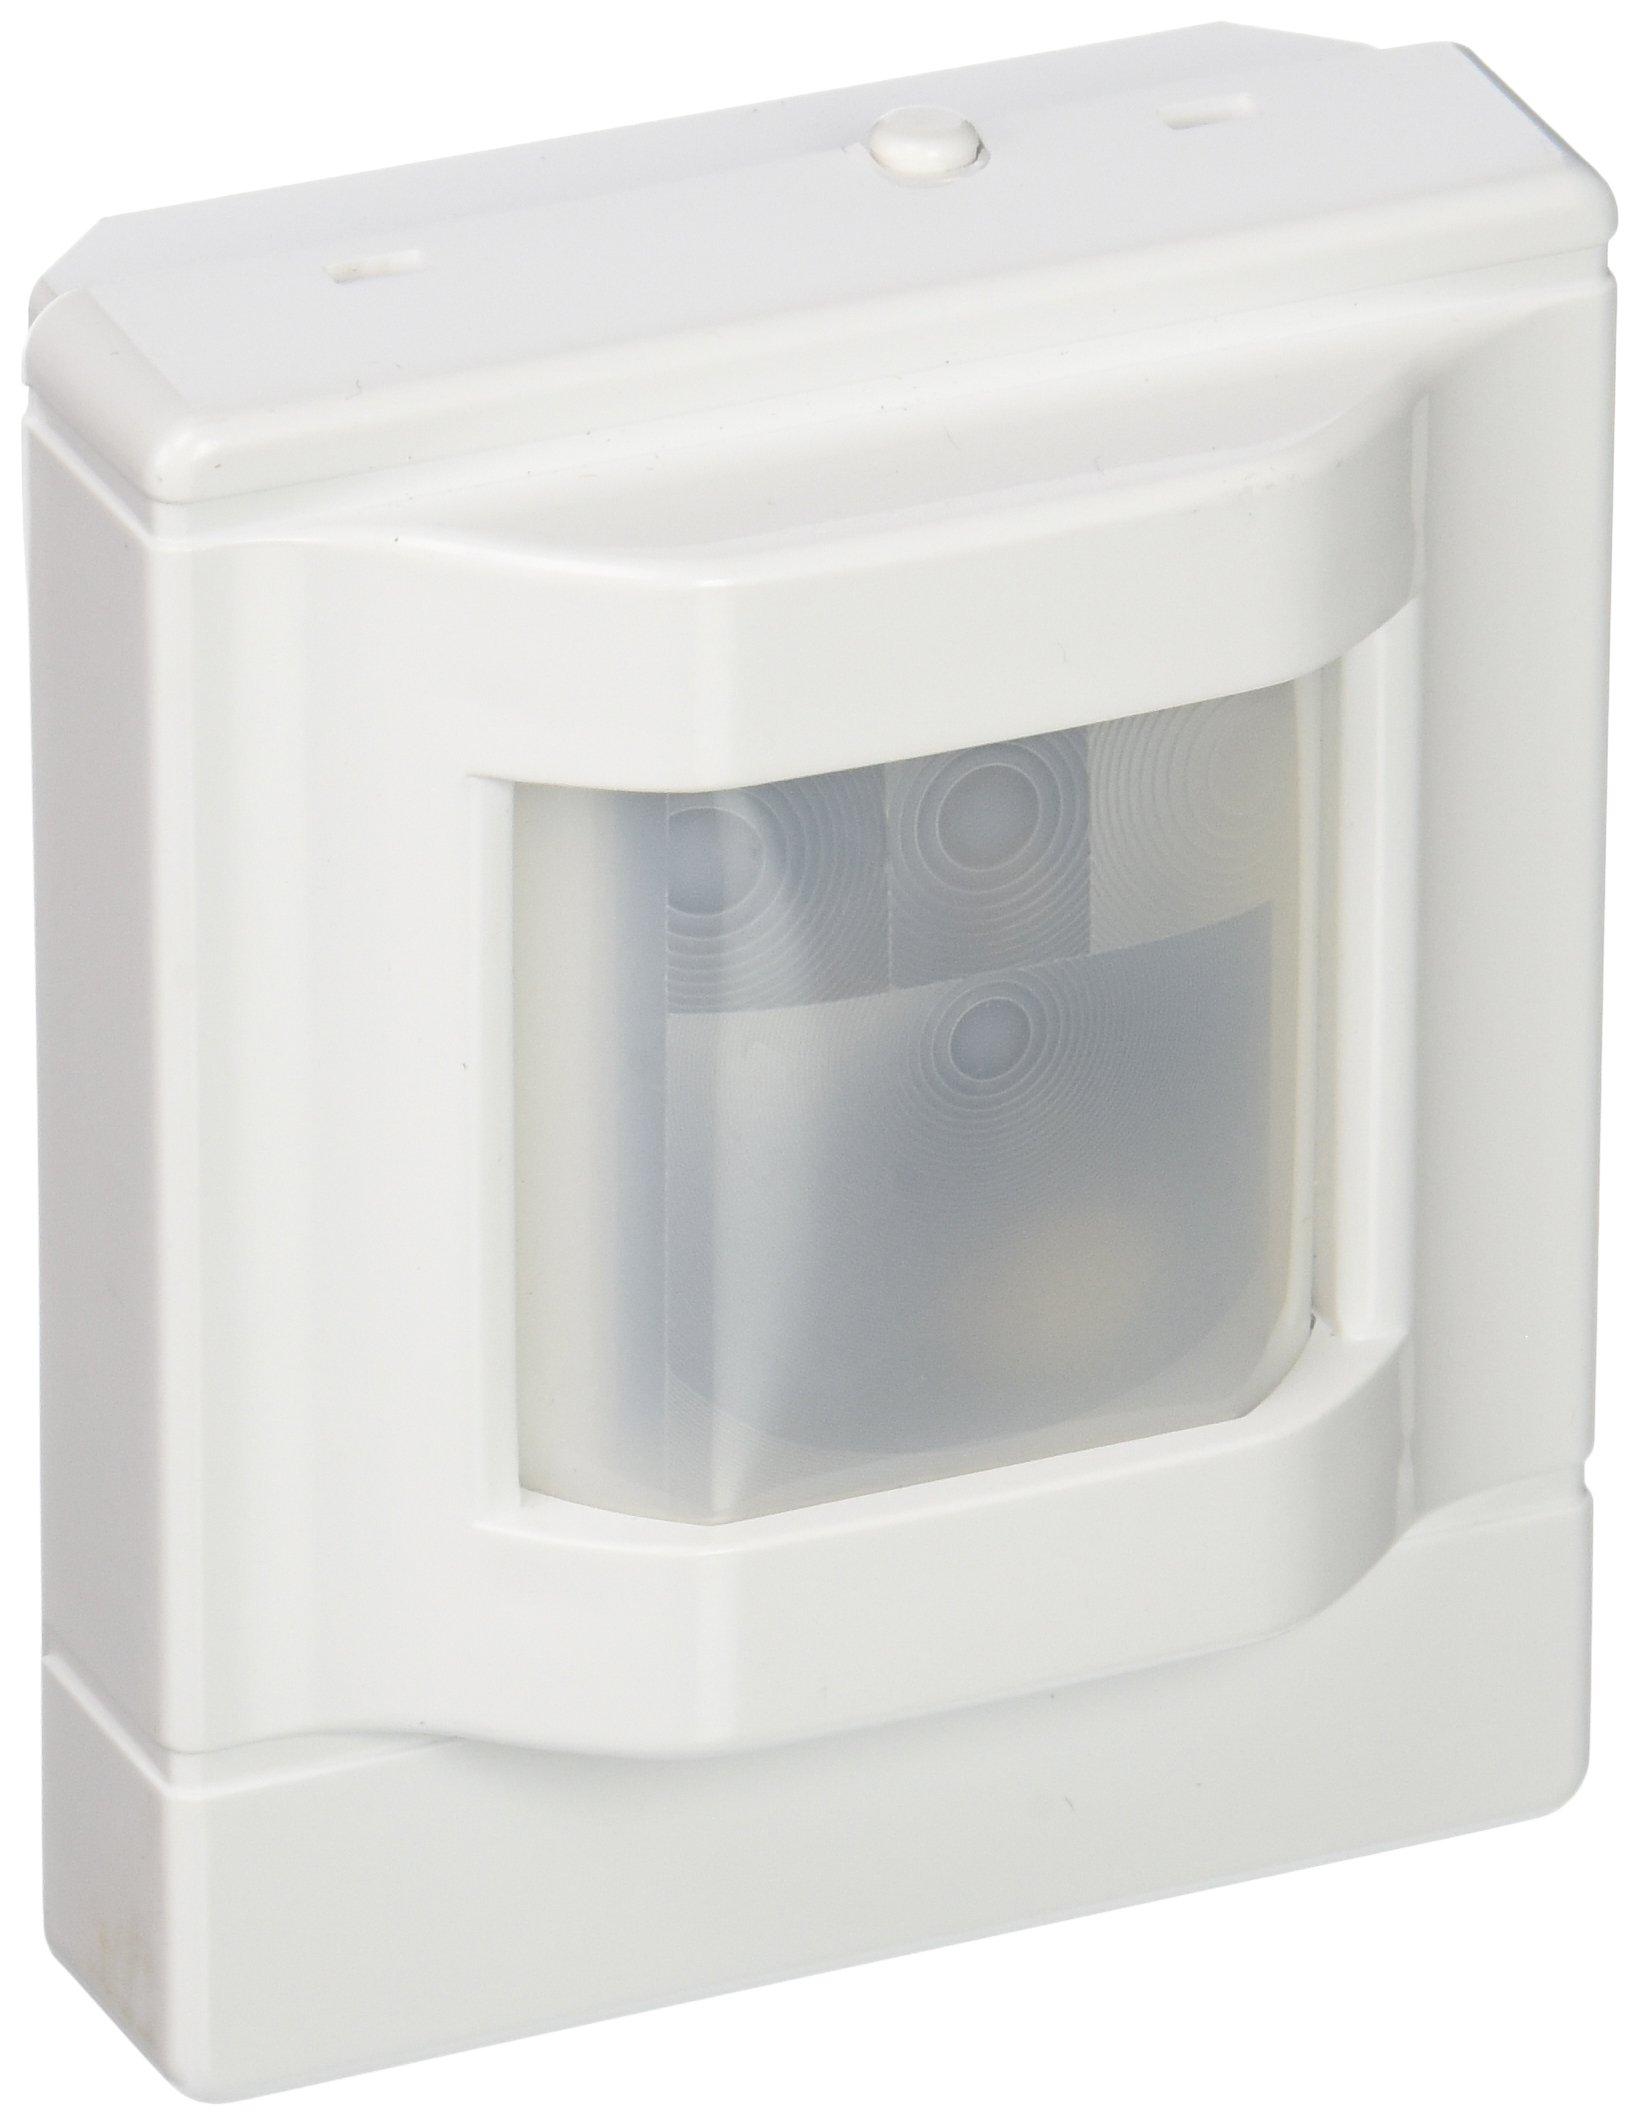 Sensor Switch HW13 Occupancy or Motion Sensing Switch